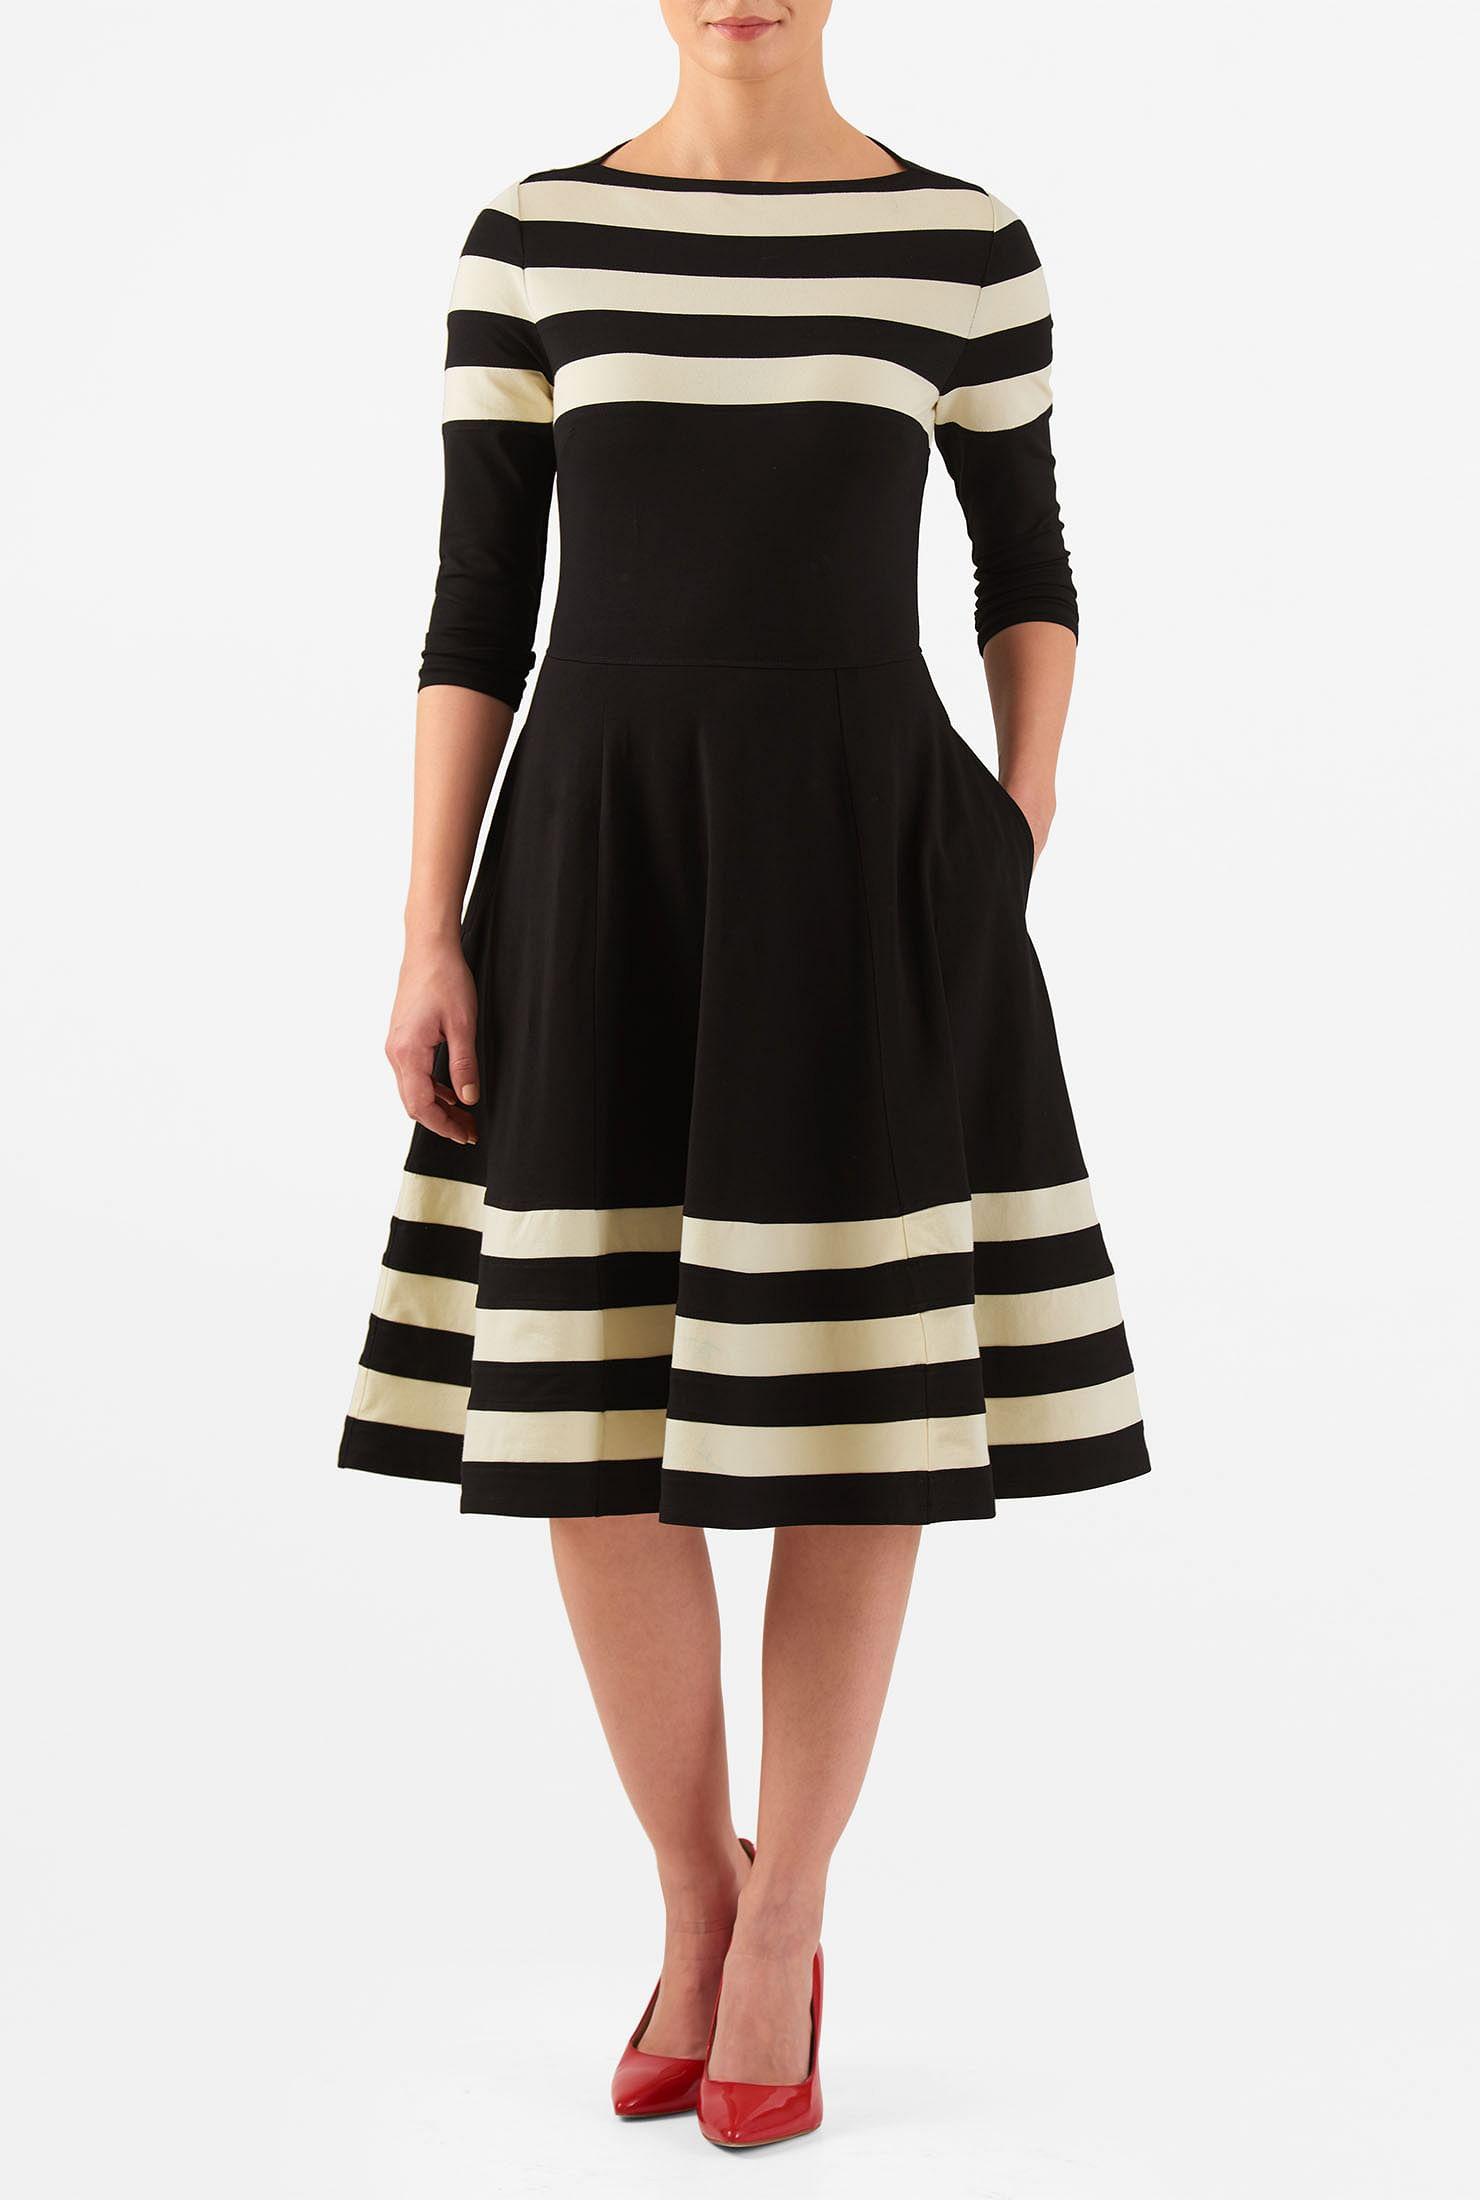 s fashion clothing 0 36w and custom